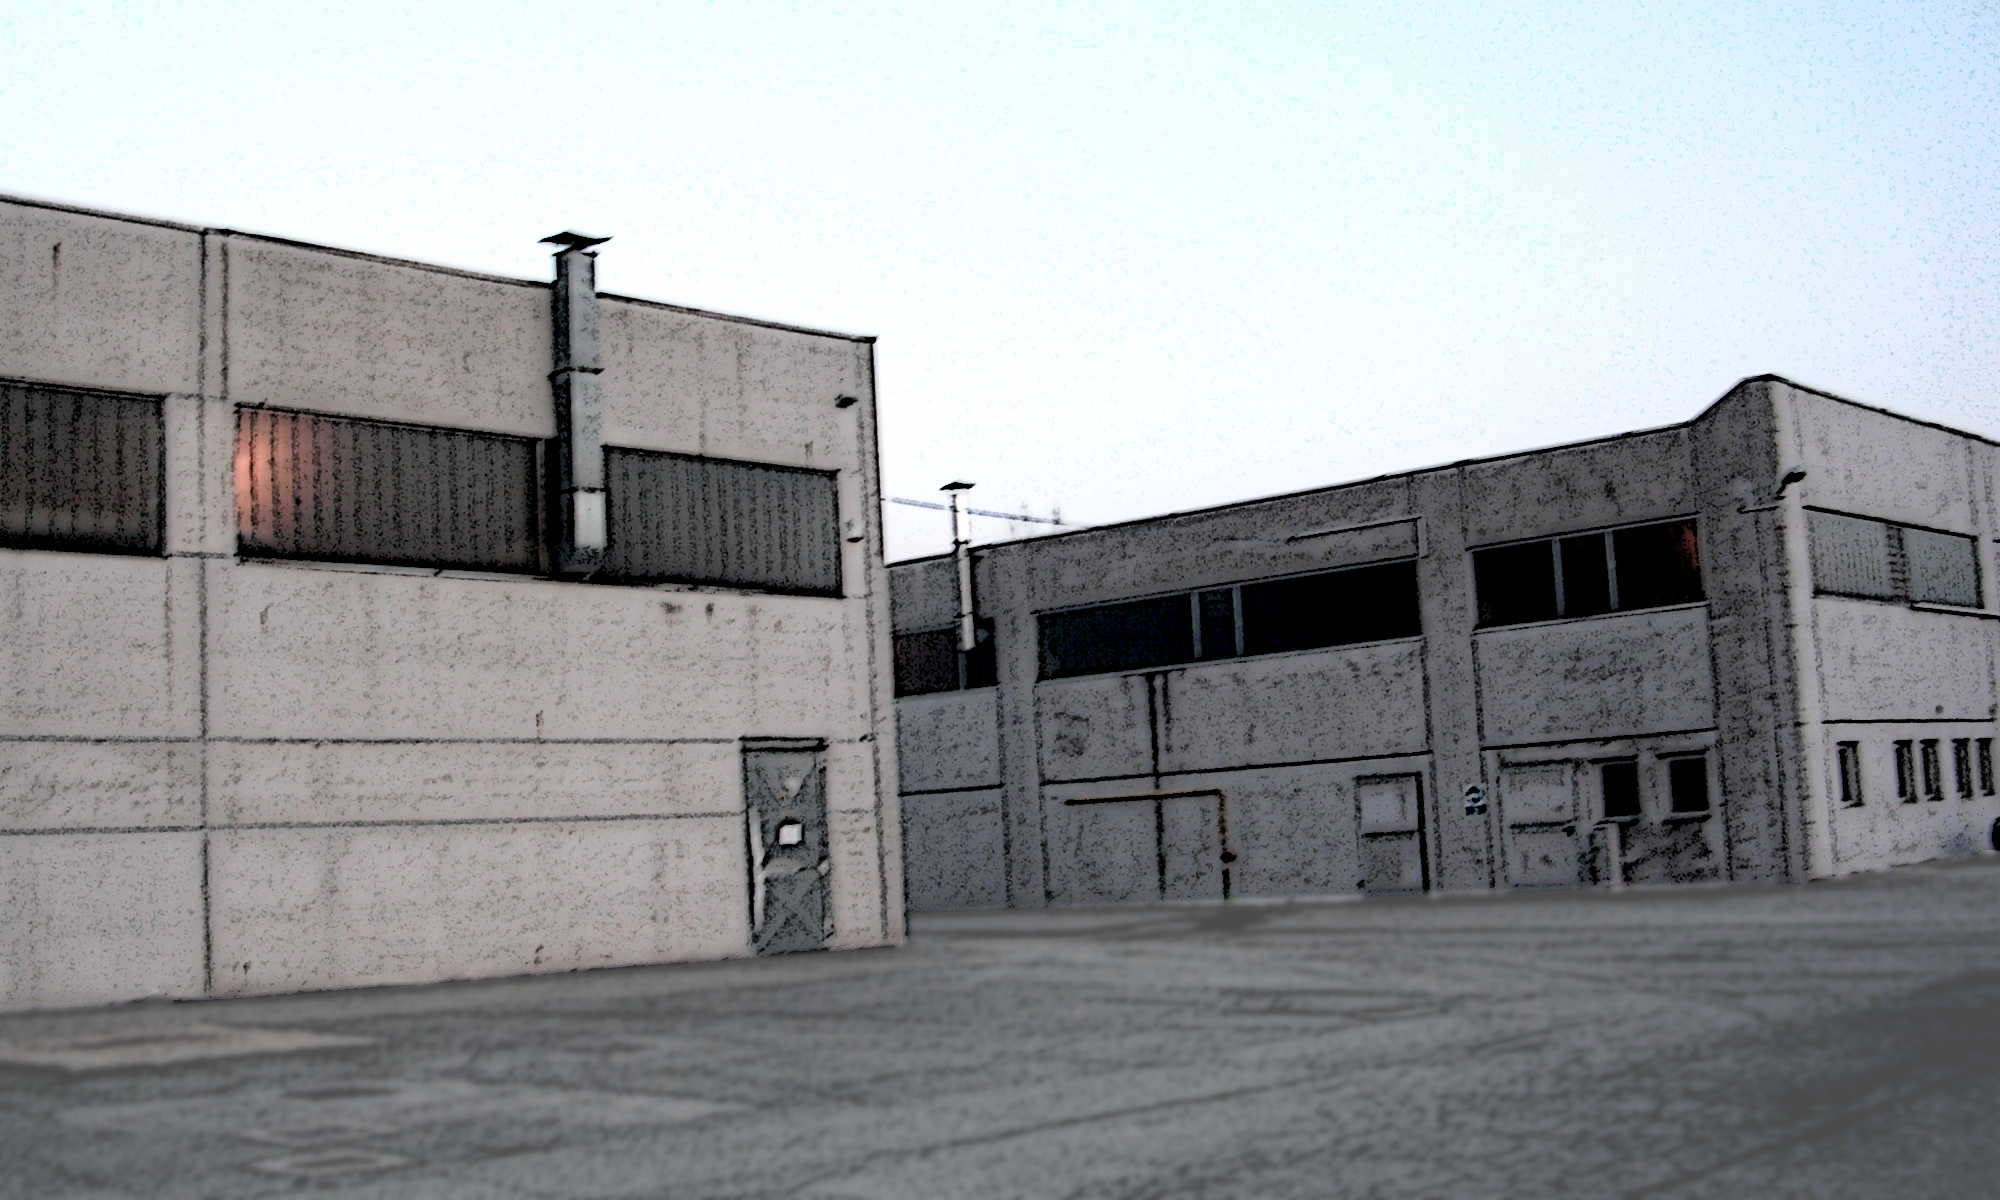 Nuova Zincorotostatica Buildings